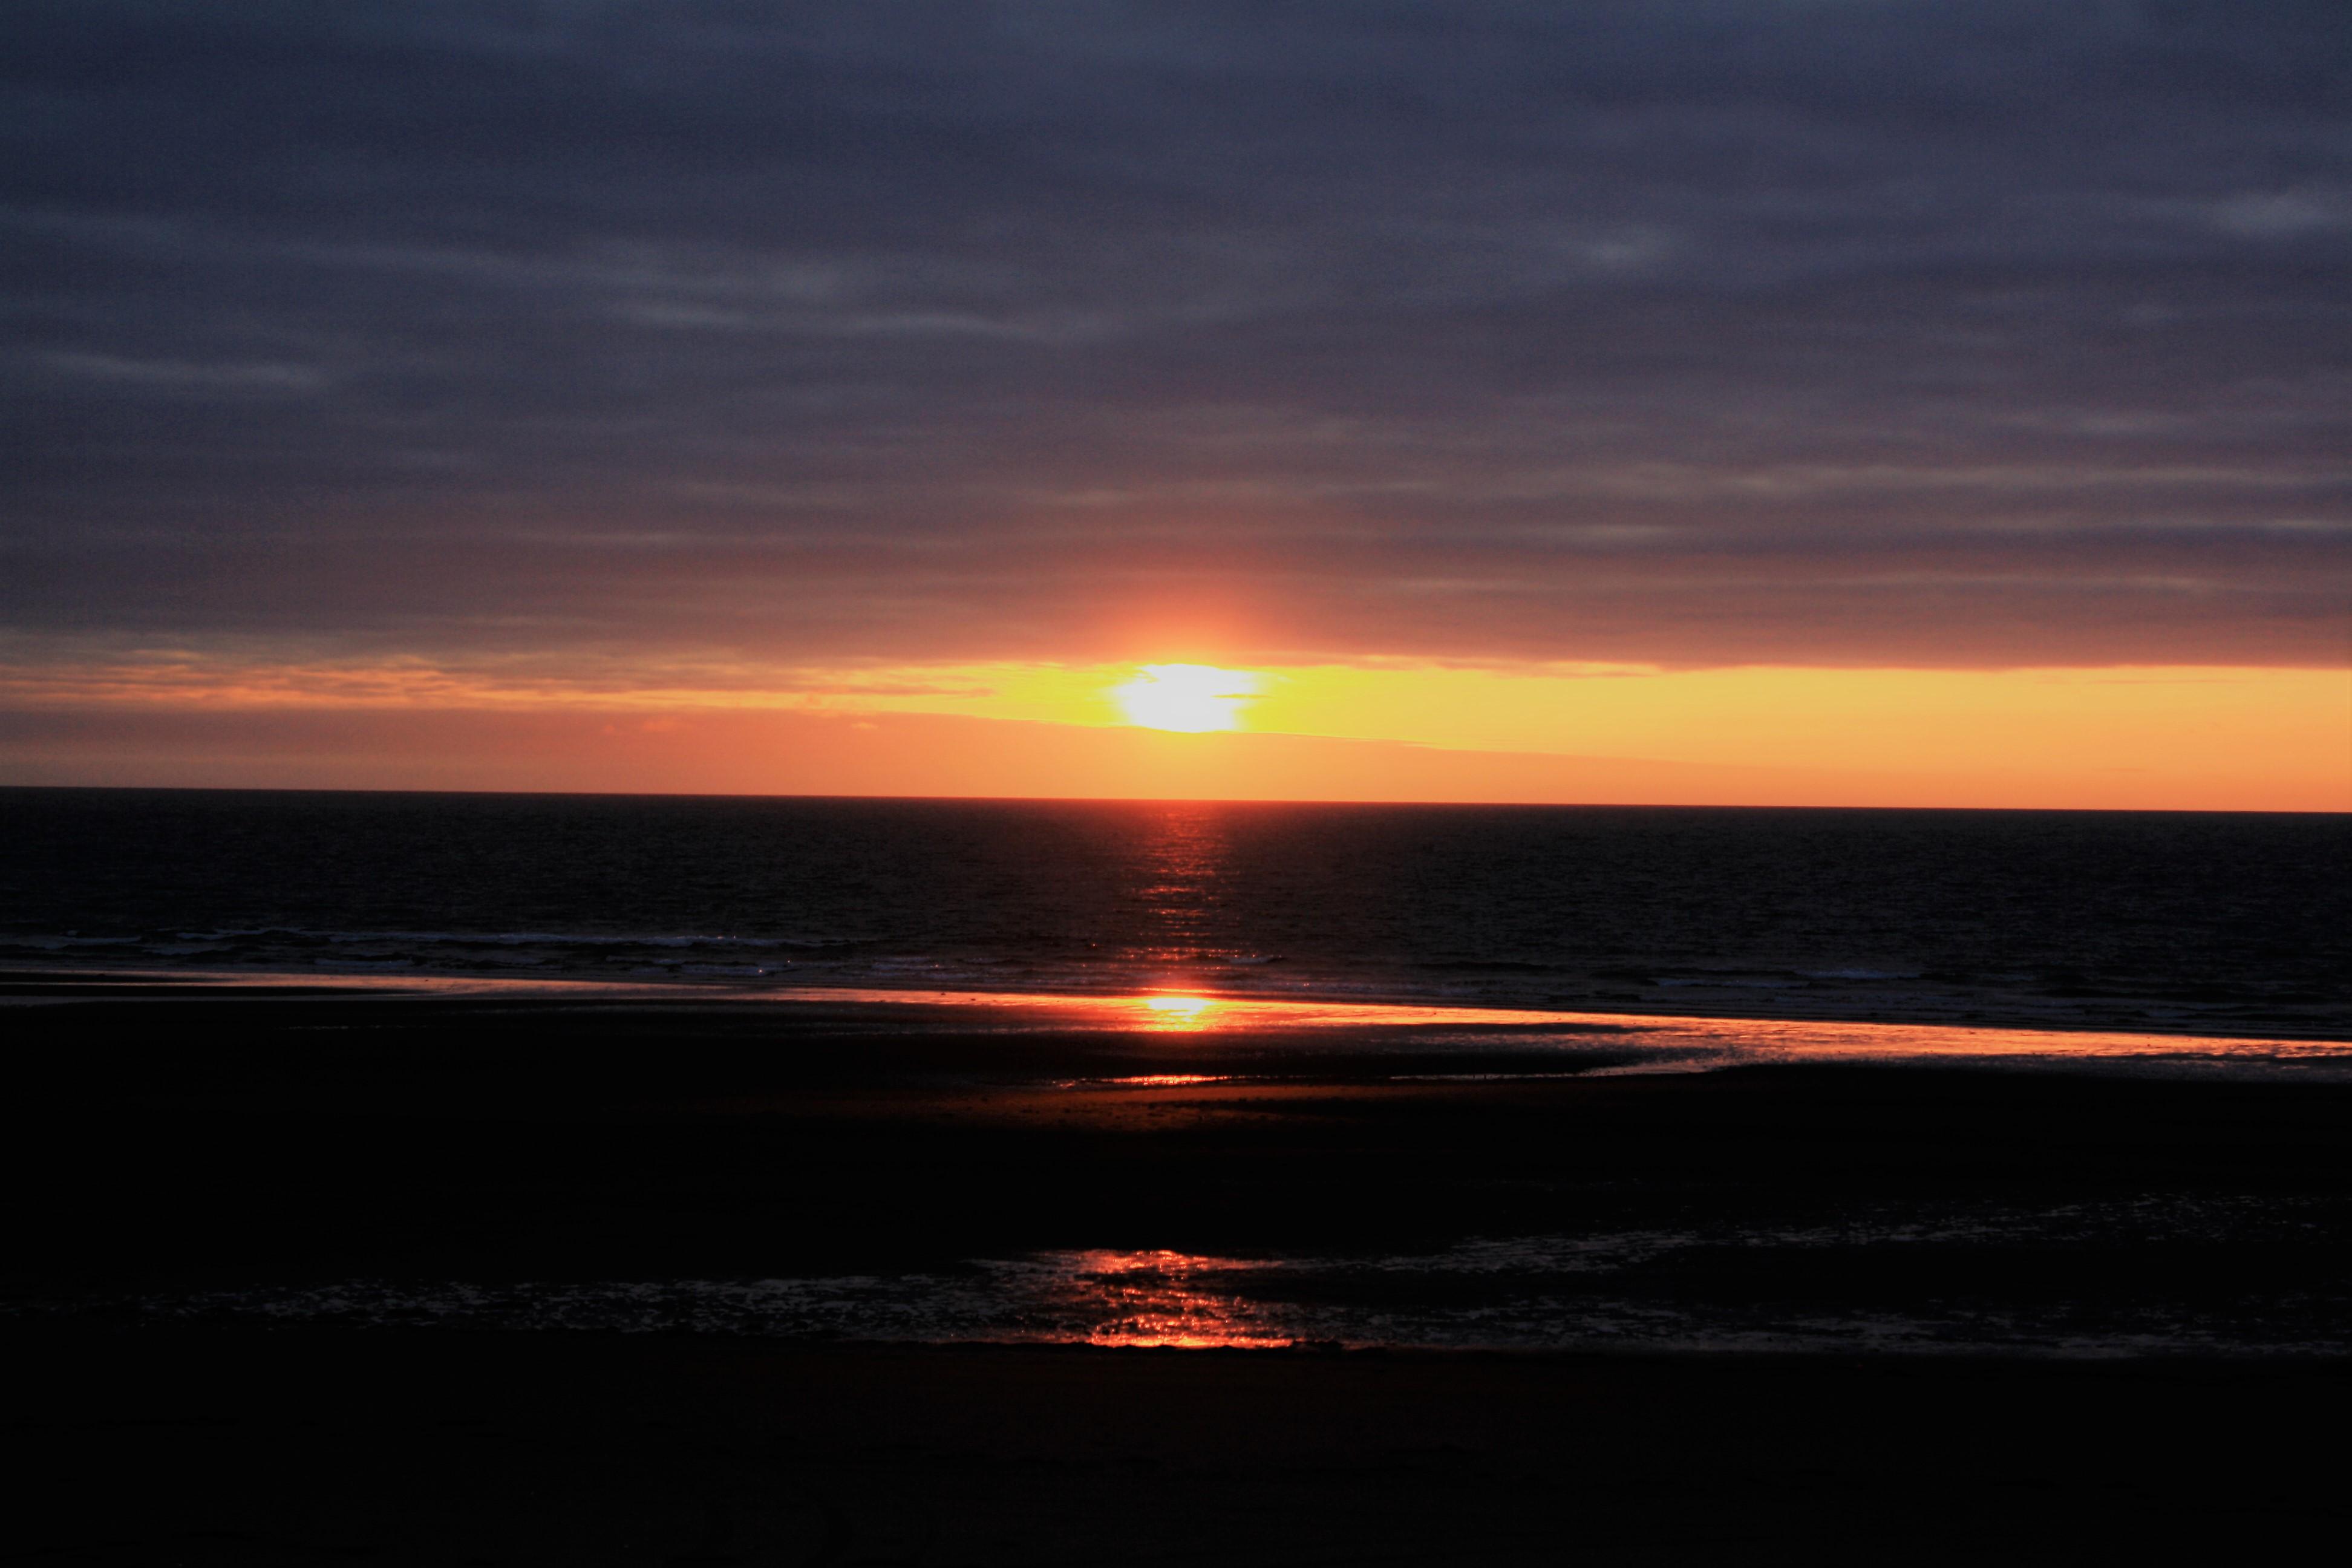 DM_nature_sunsetssunrises_haidagwaii_220